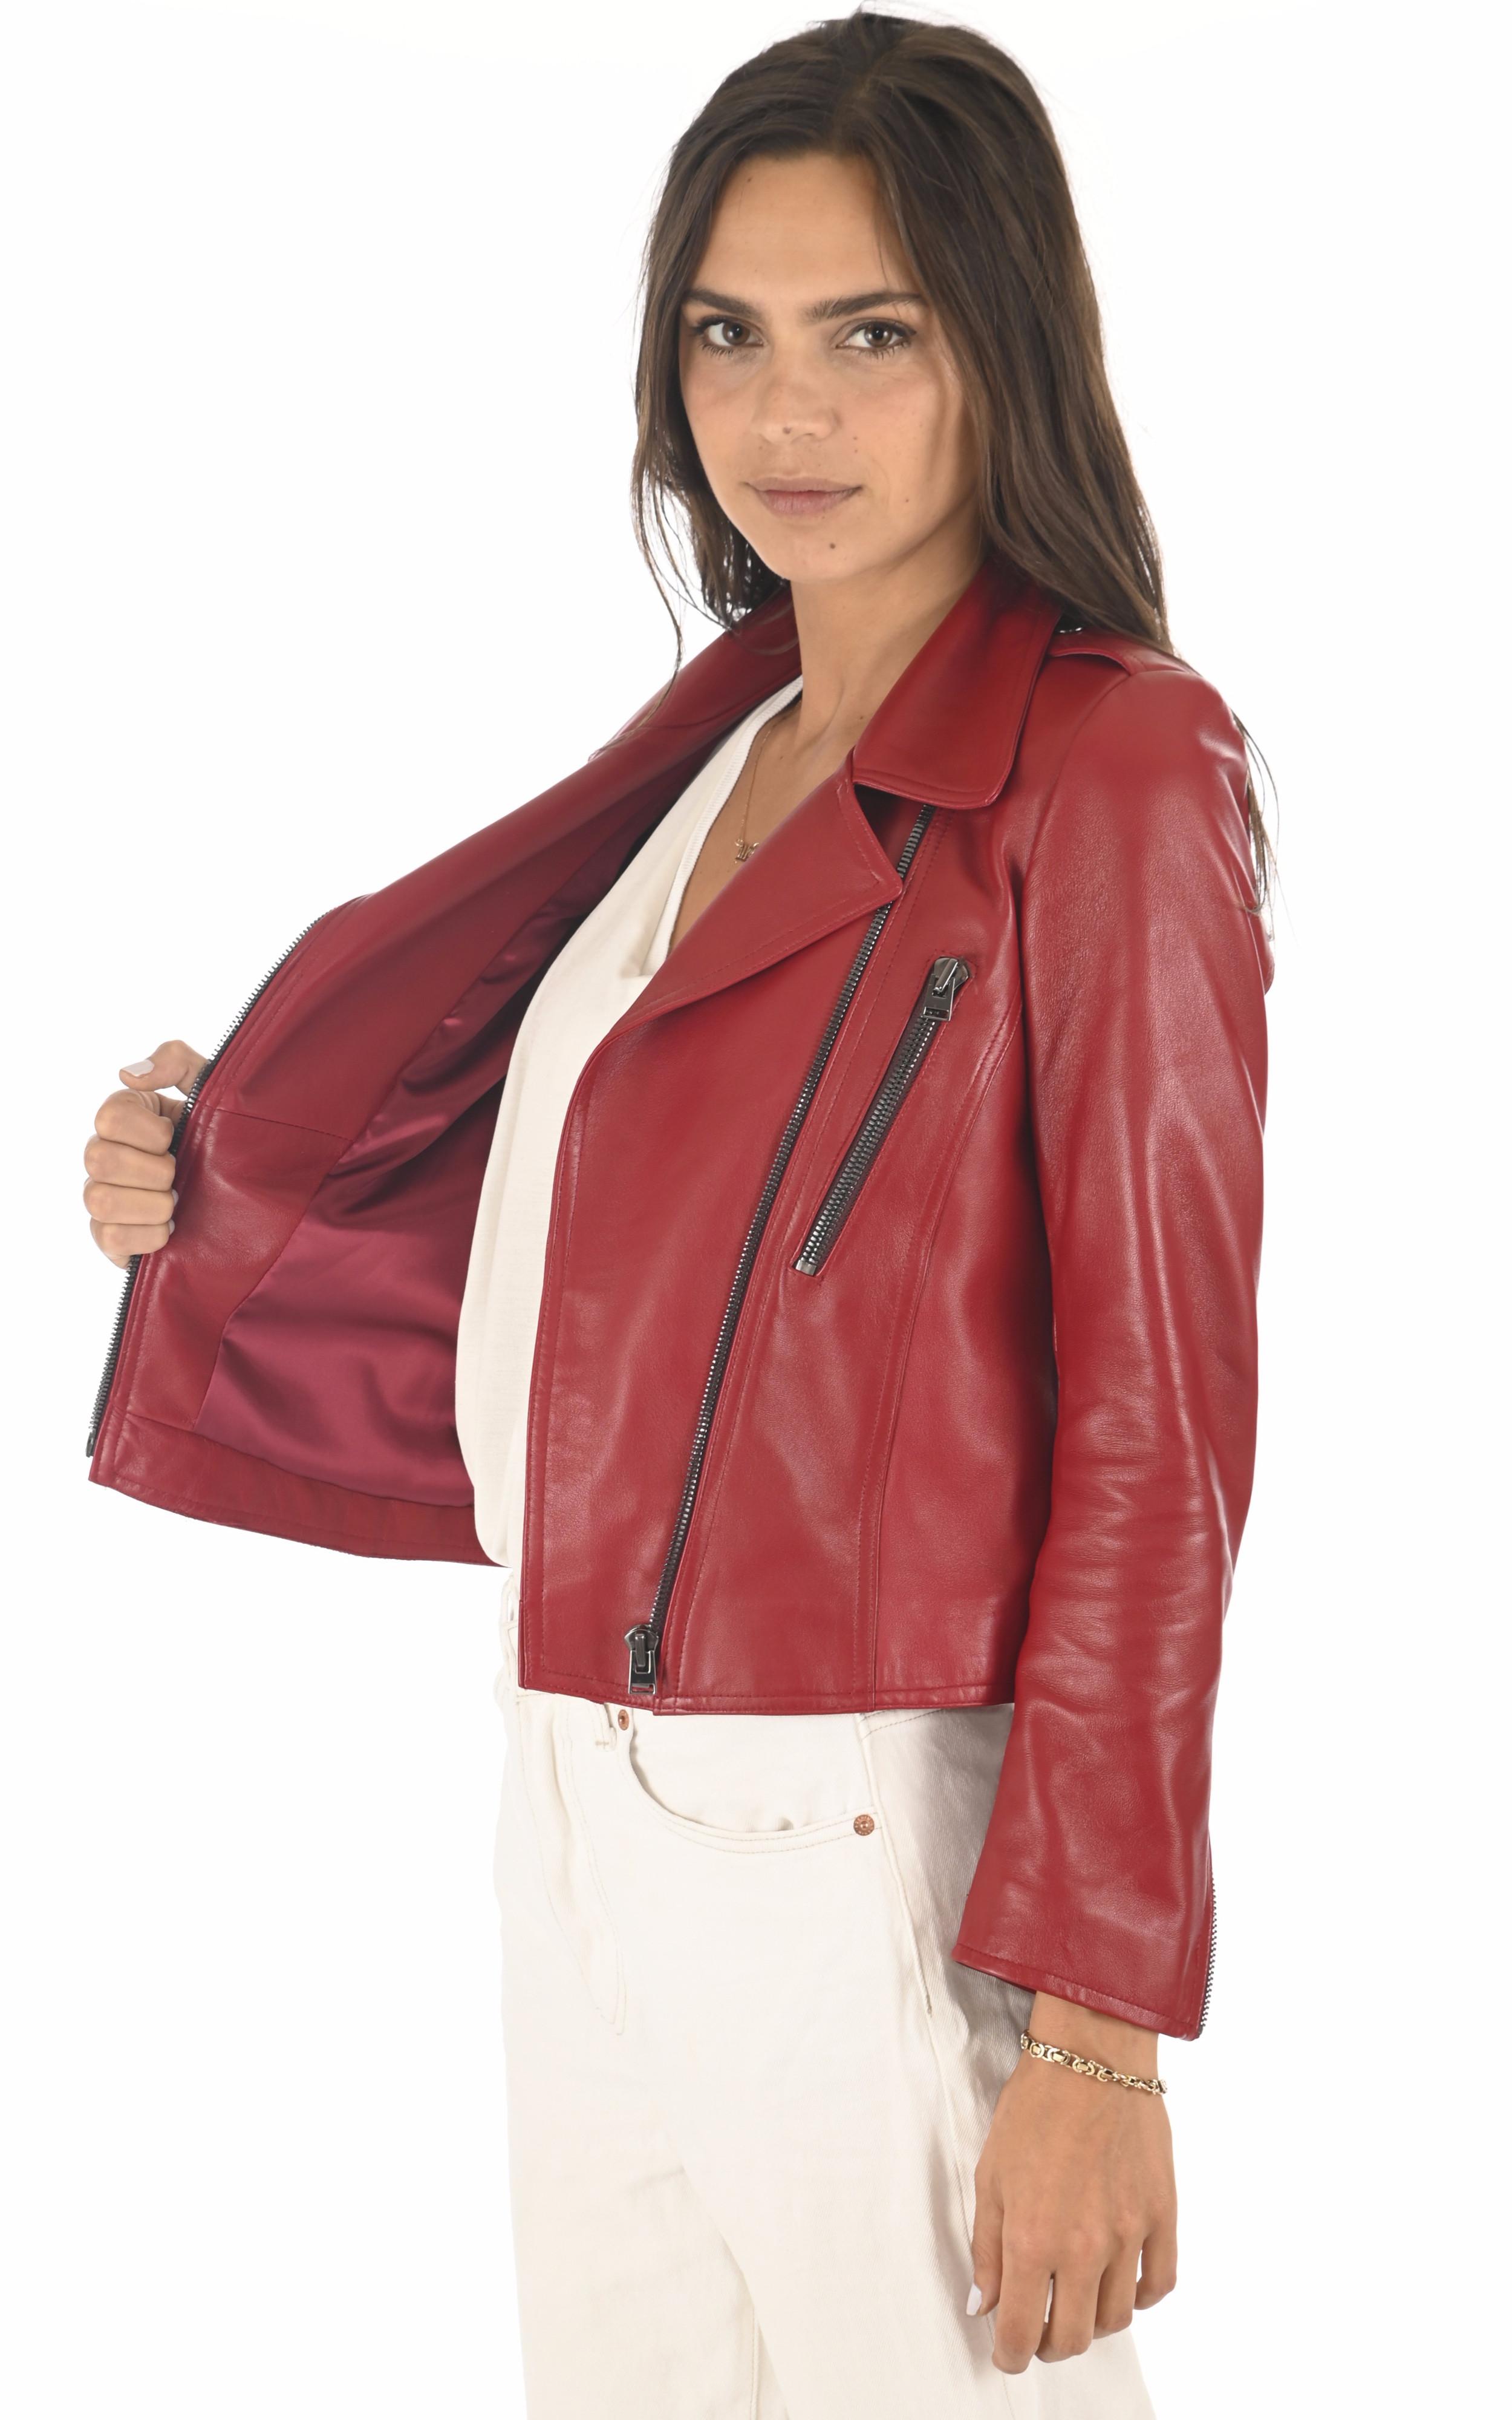 Blouson en cuir rouge femme La Canadienne